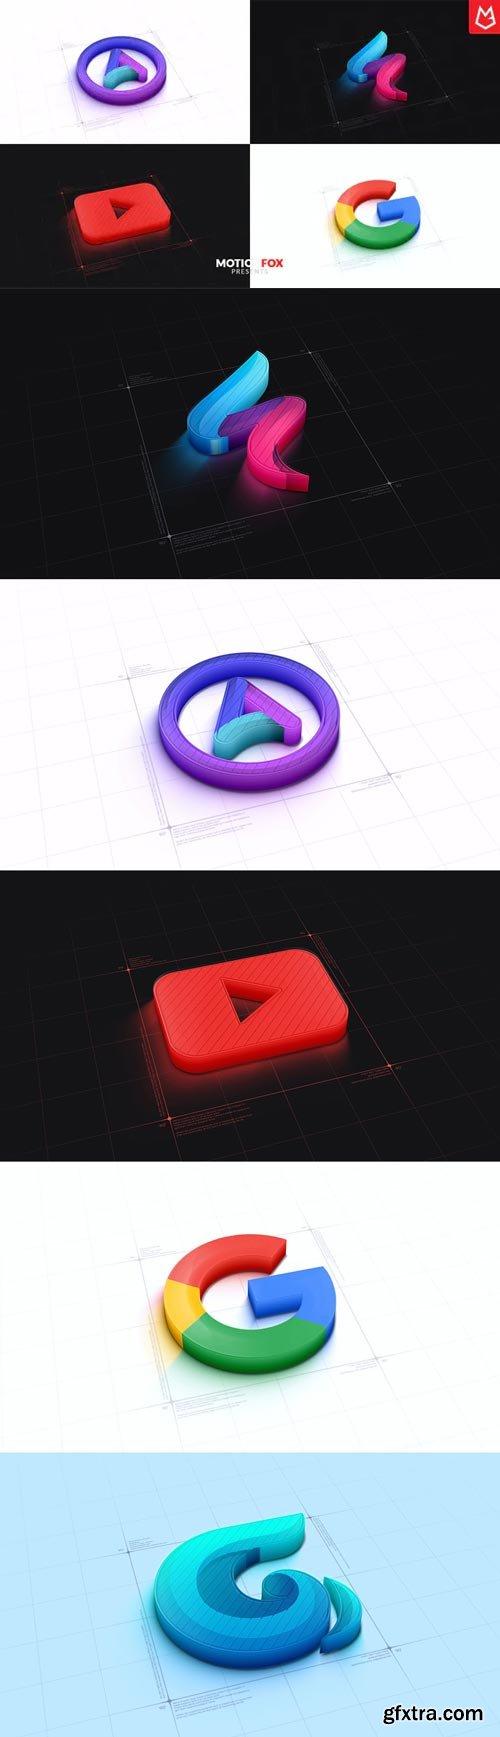 Videohive - Simple Sketch Logo Reveal v1 - 32358686